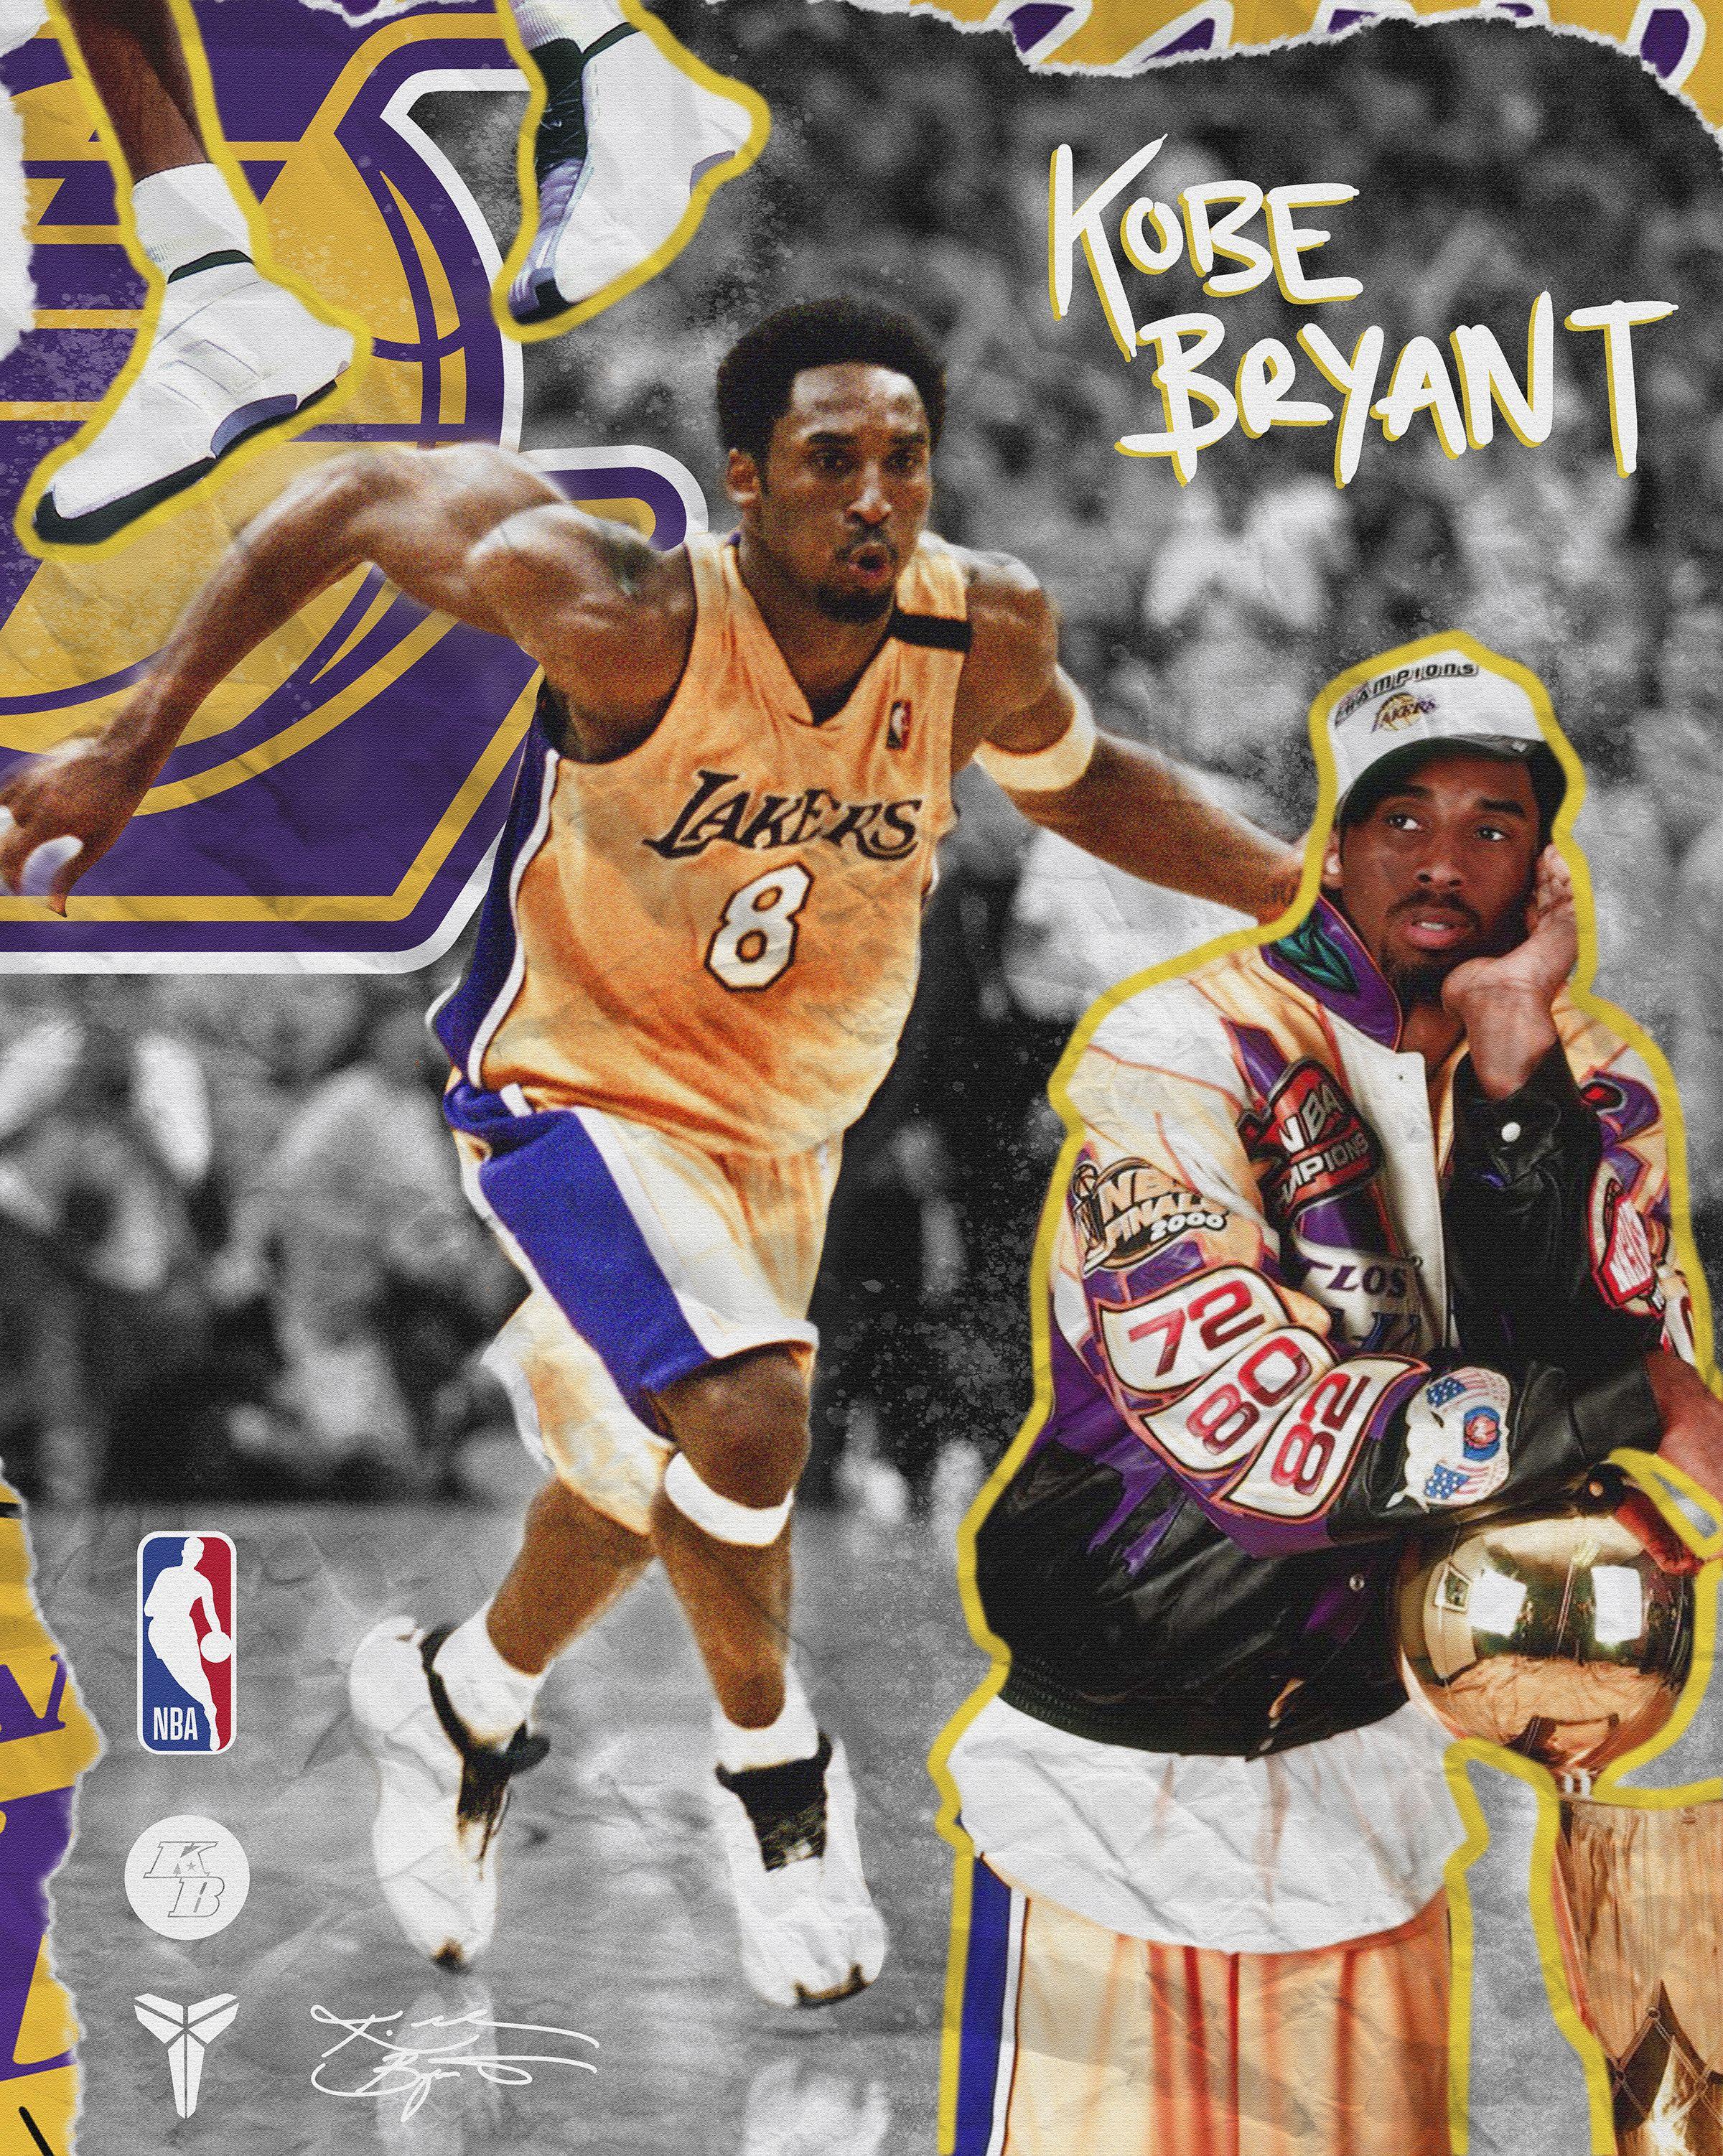 Kobe Bryant X Mambaforever 2020 Nba Los Angeles Lakers Playoffs In 2020 Los Angeles Lakers Lakers Nba